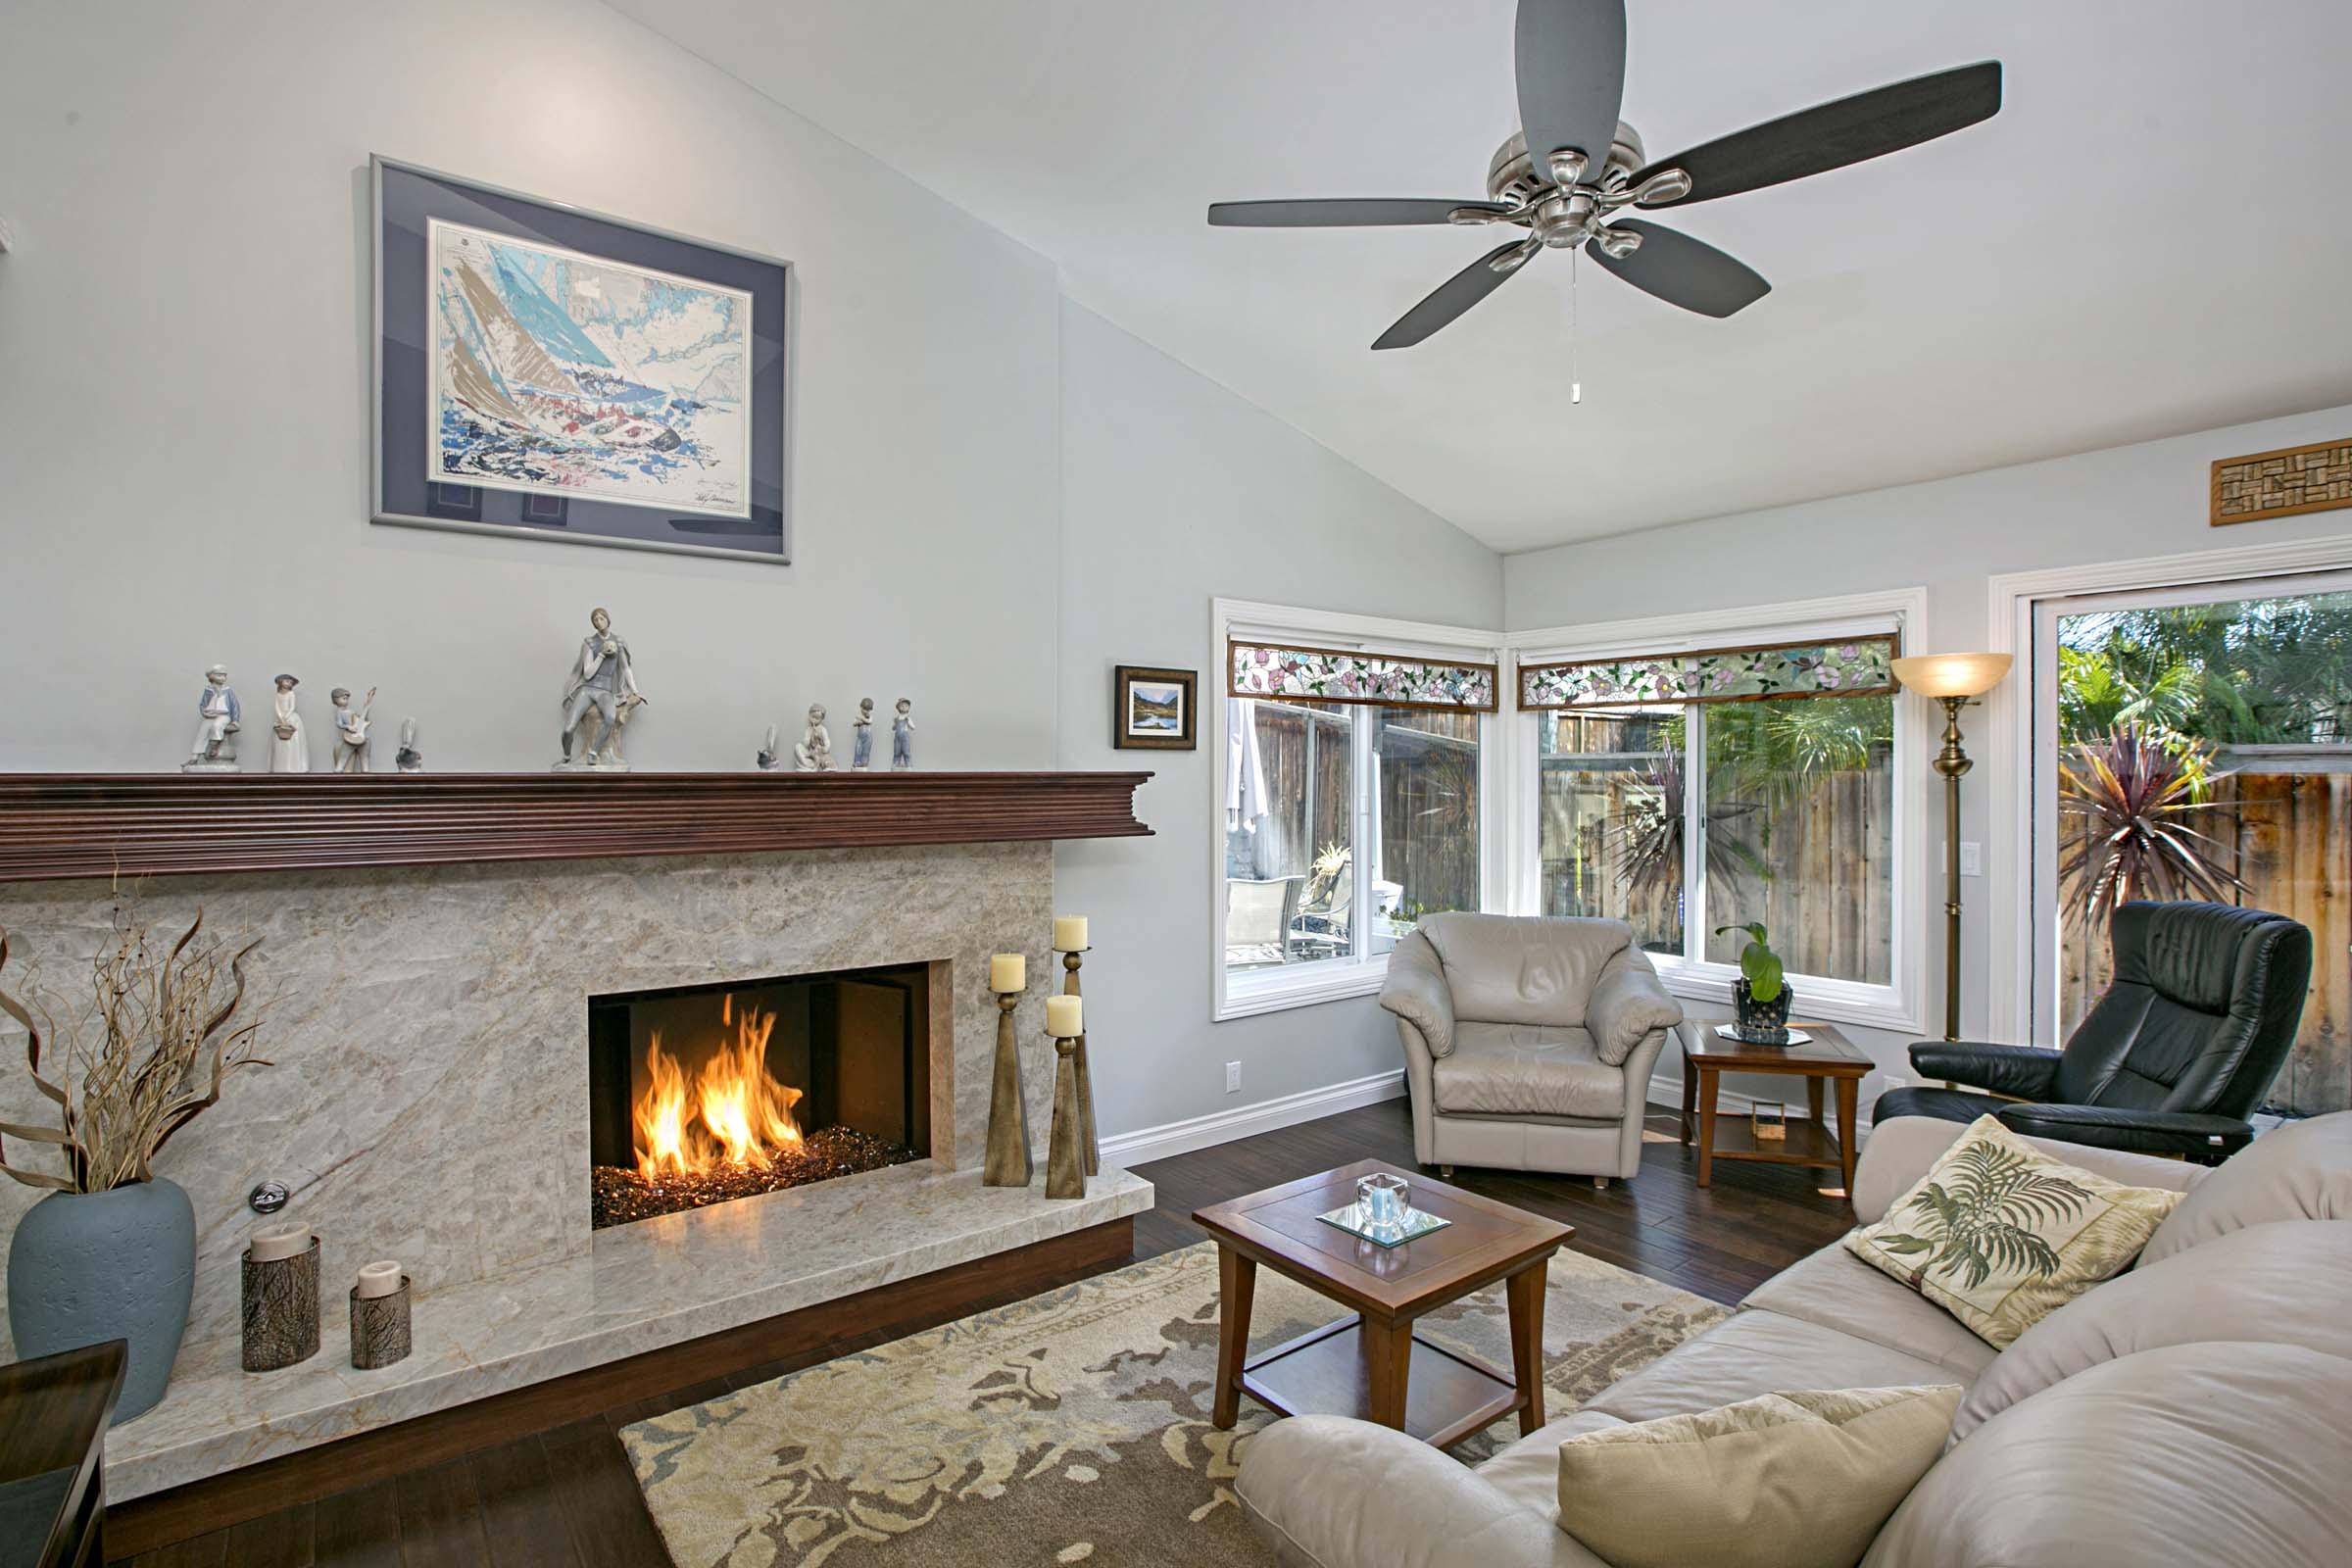 - Rancho Penasquitos Fireplace